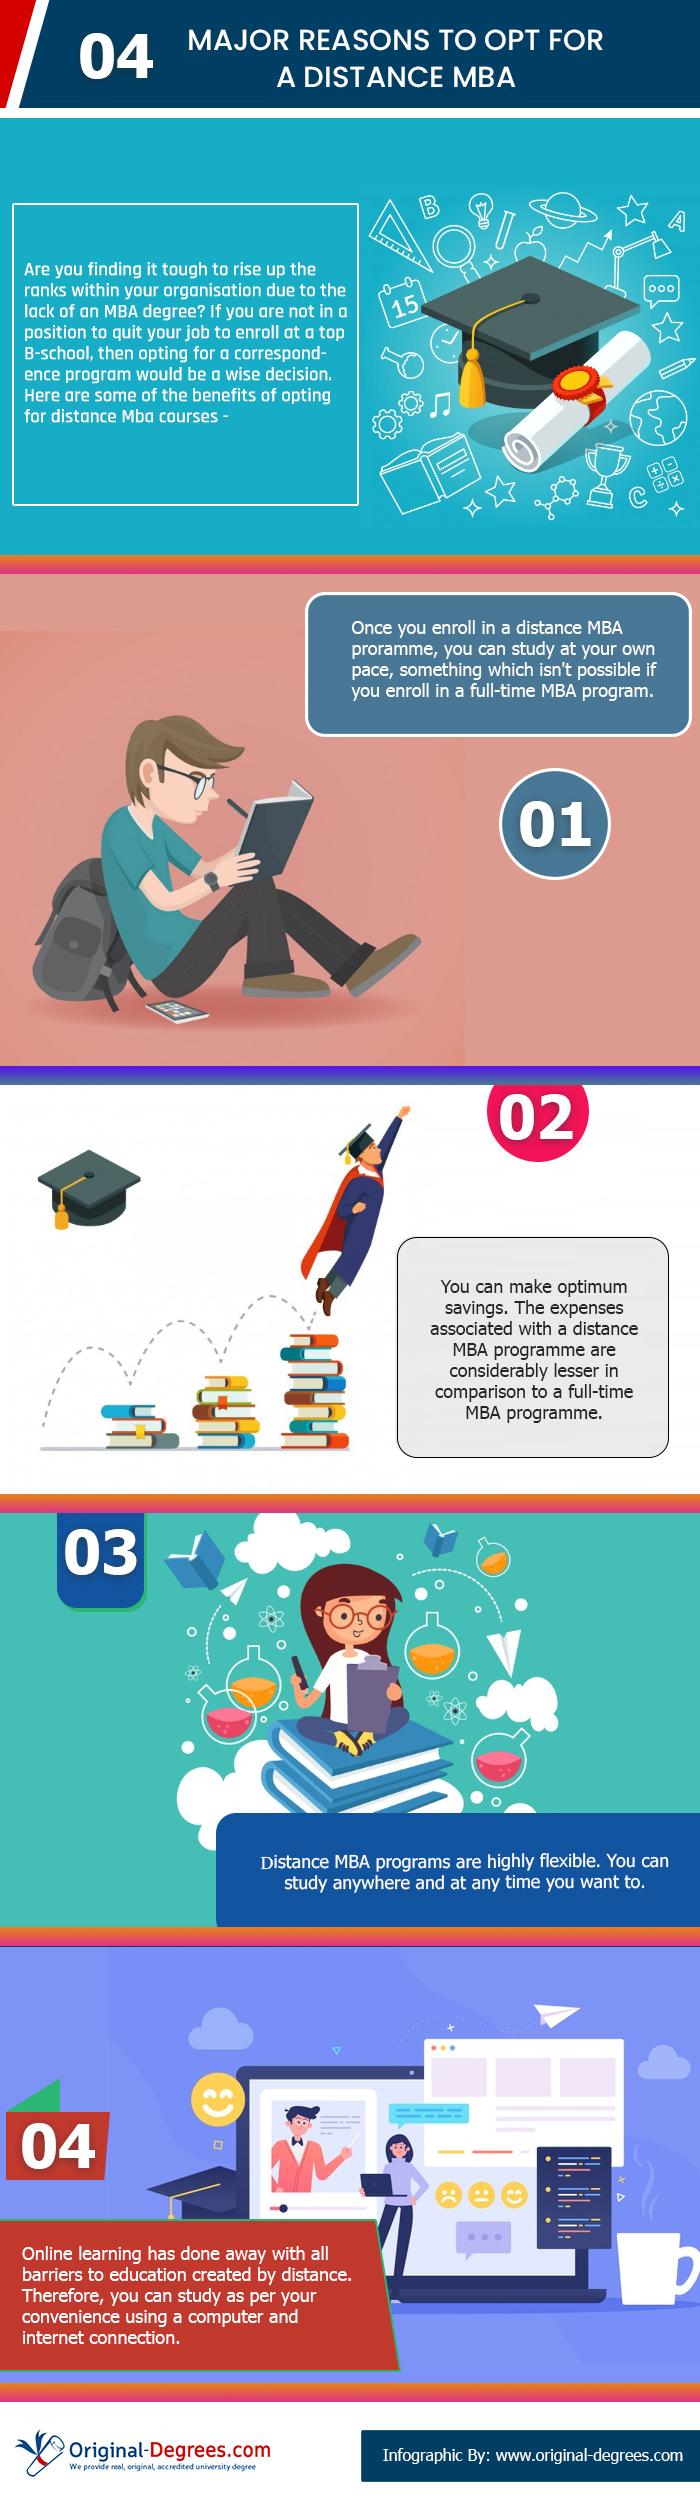 Distance MBA programme